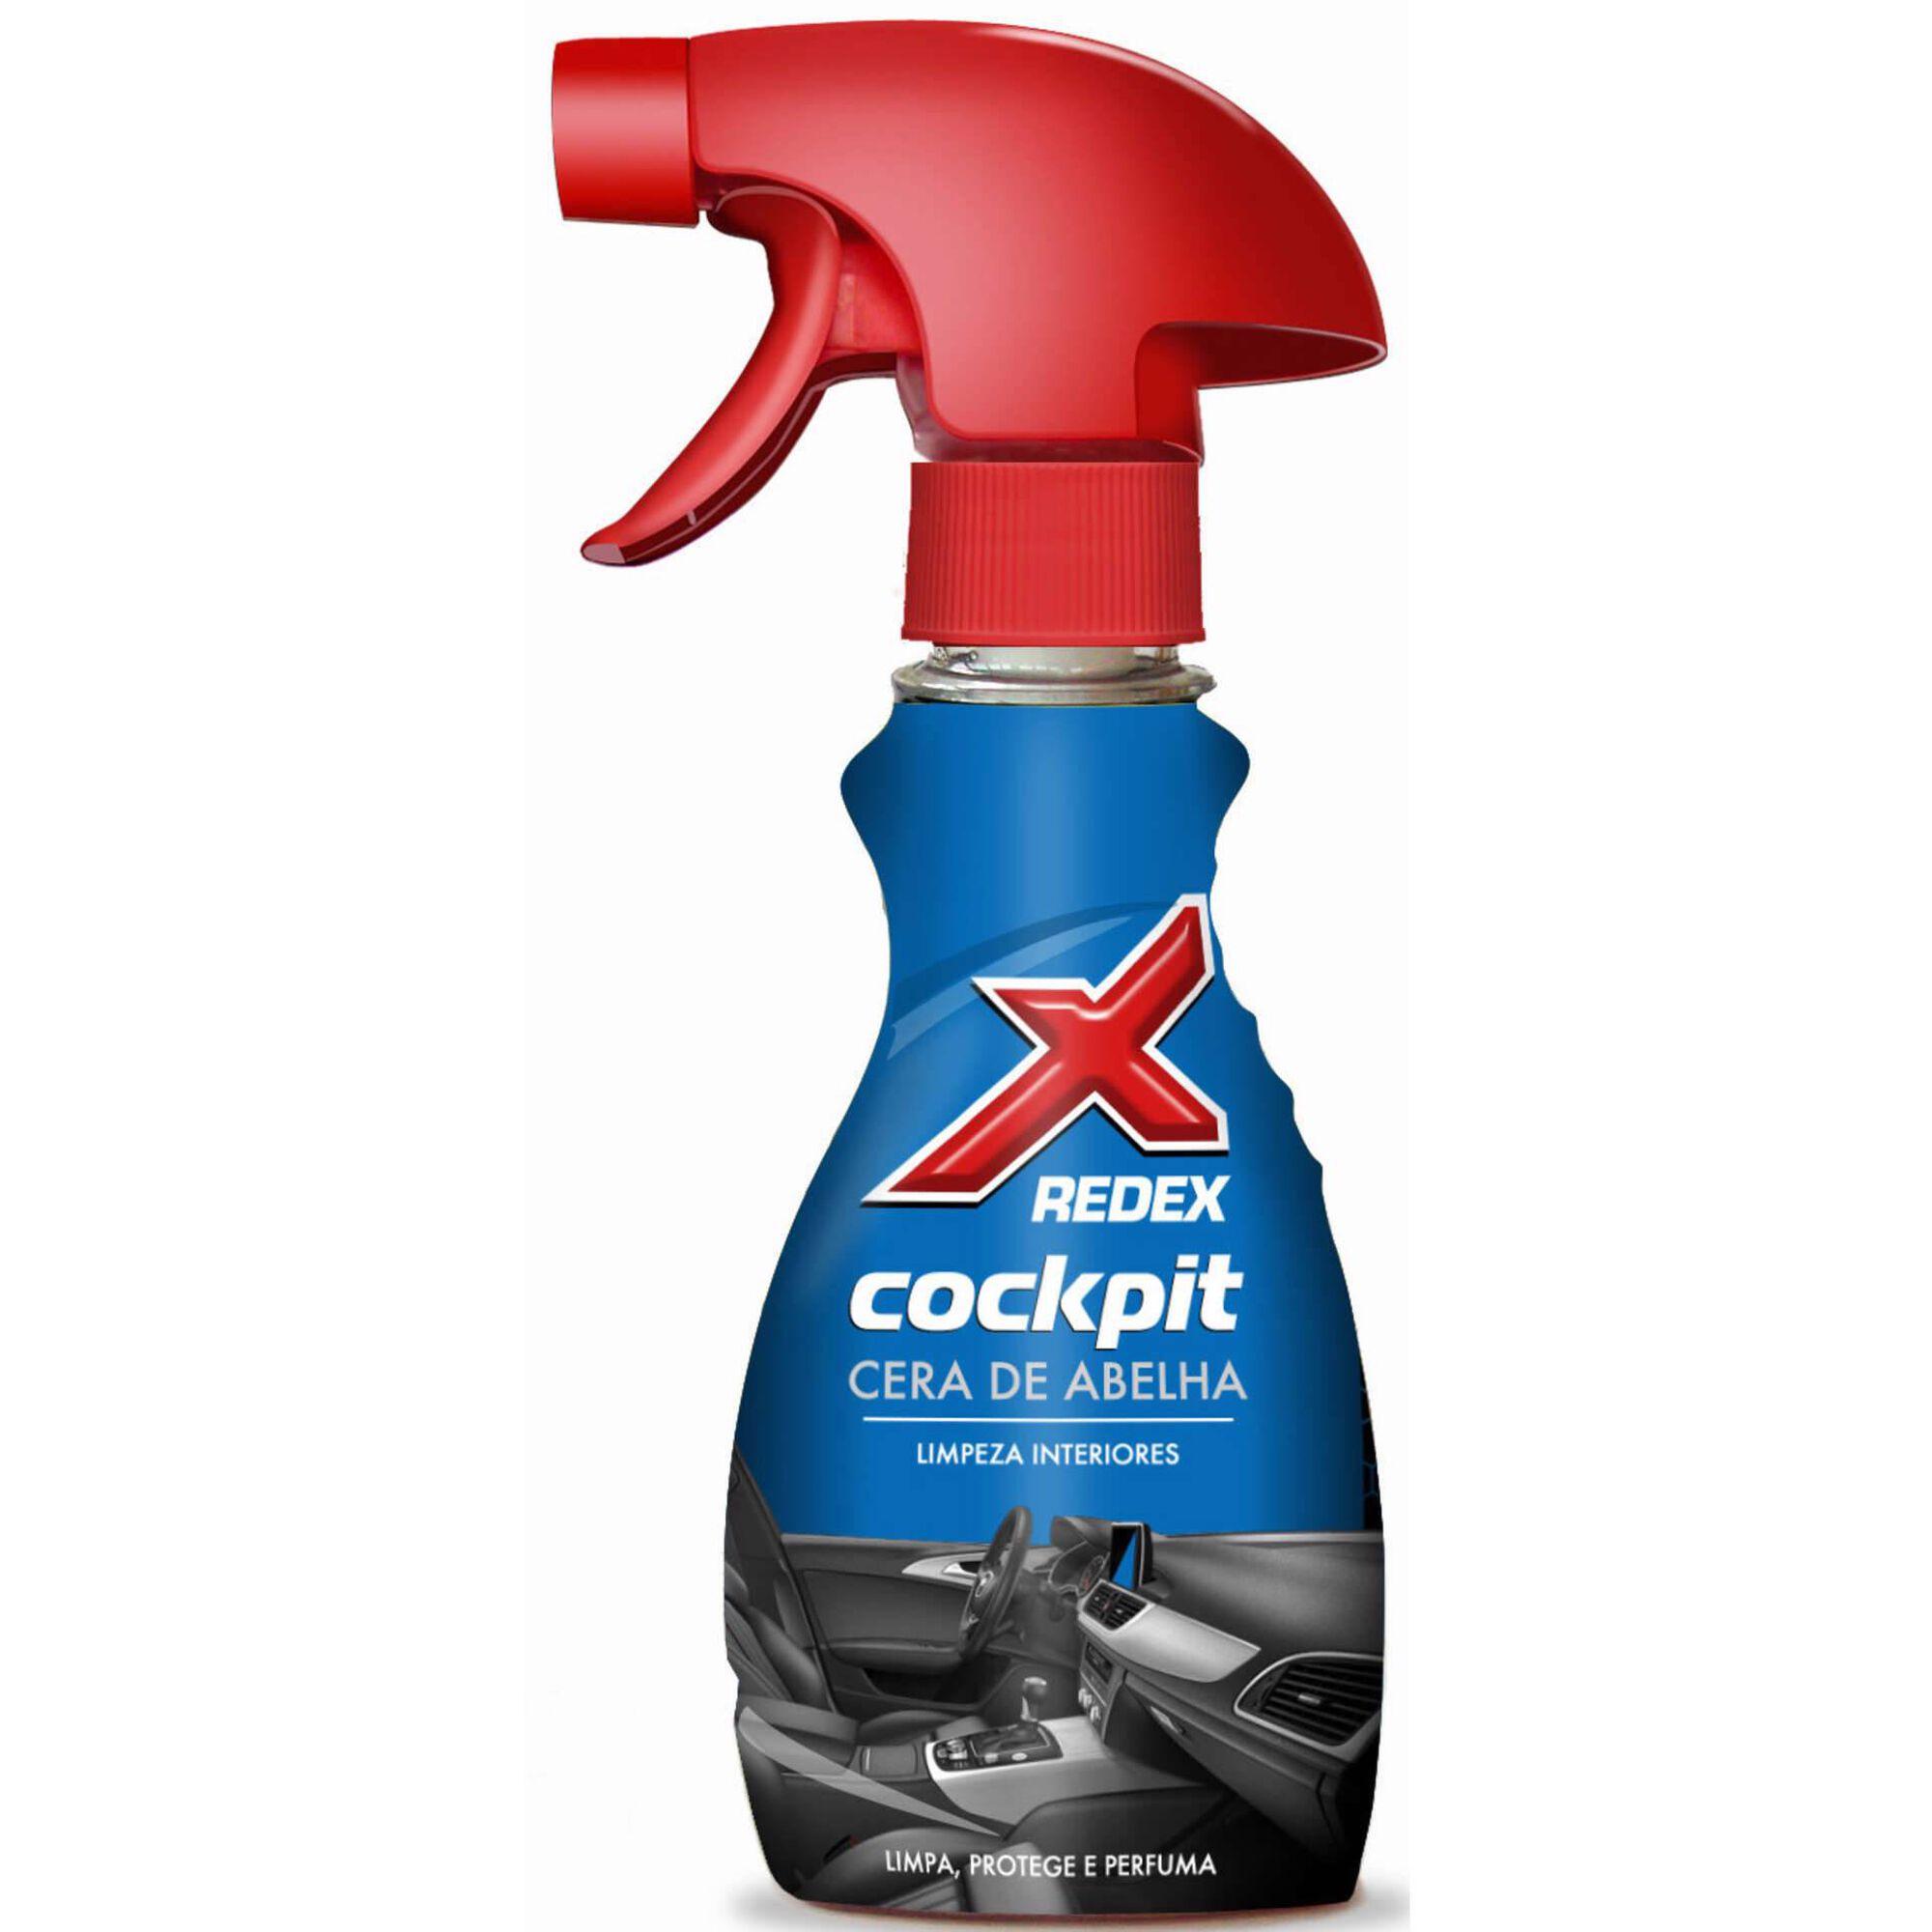 Spray Cockpit Cera Abelhas 200ml